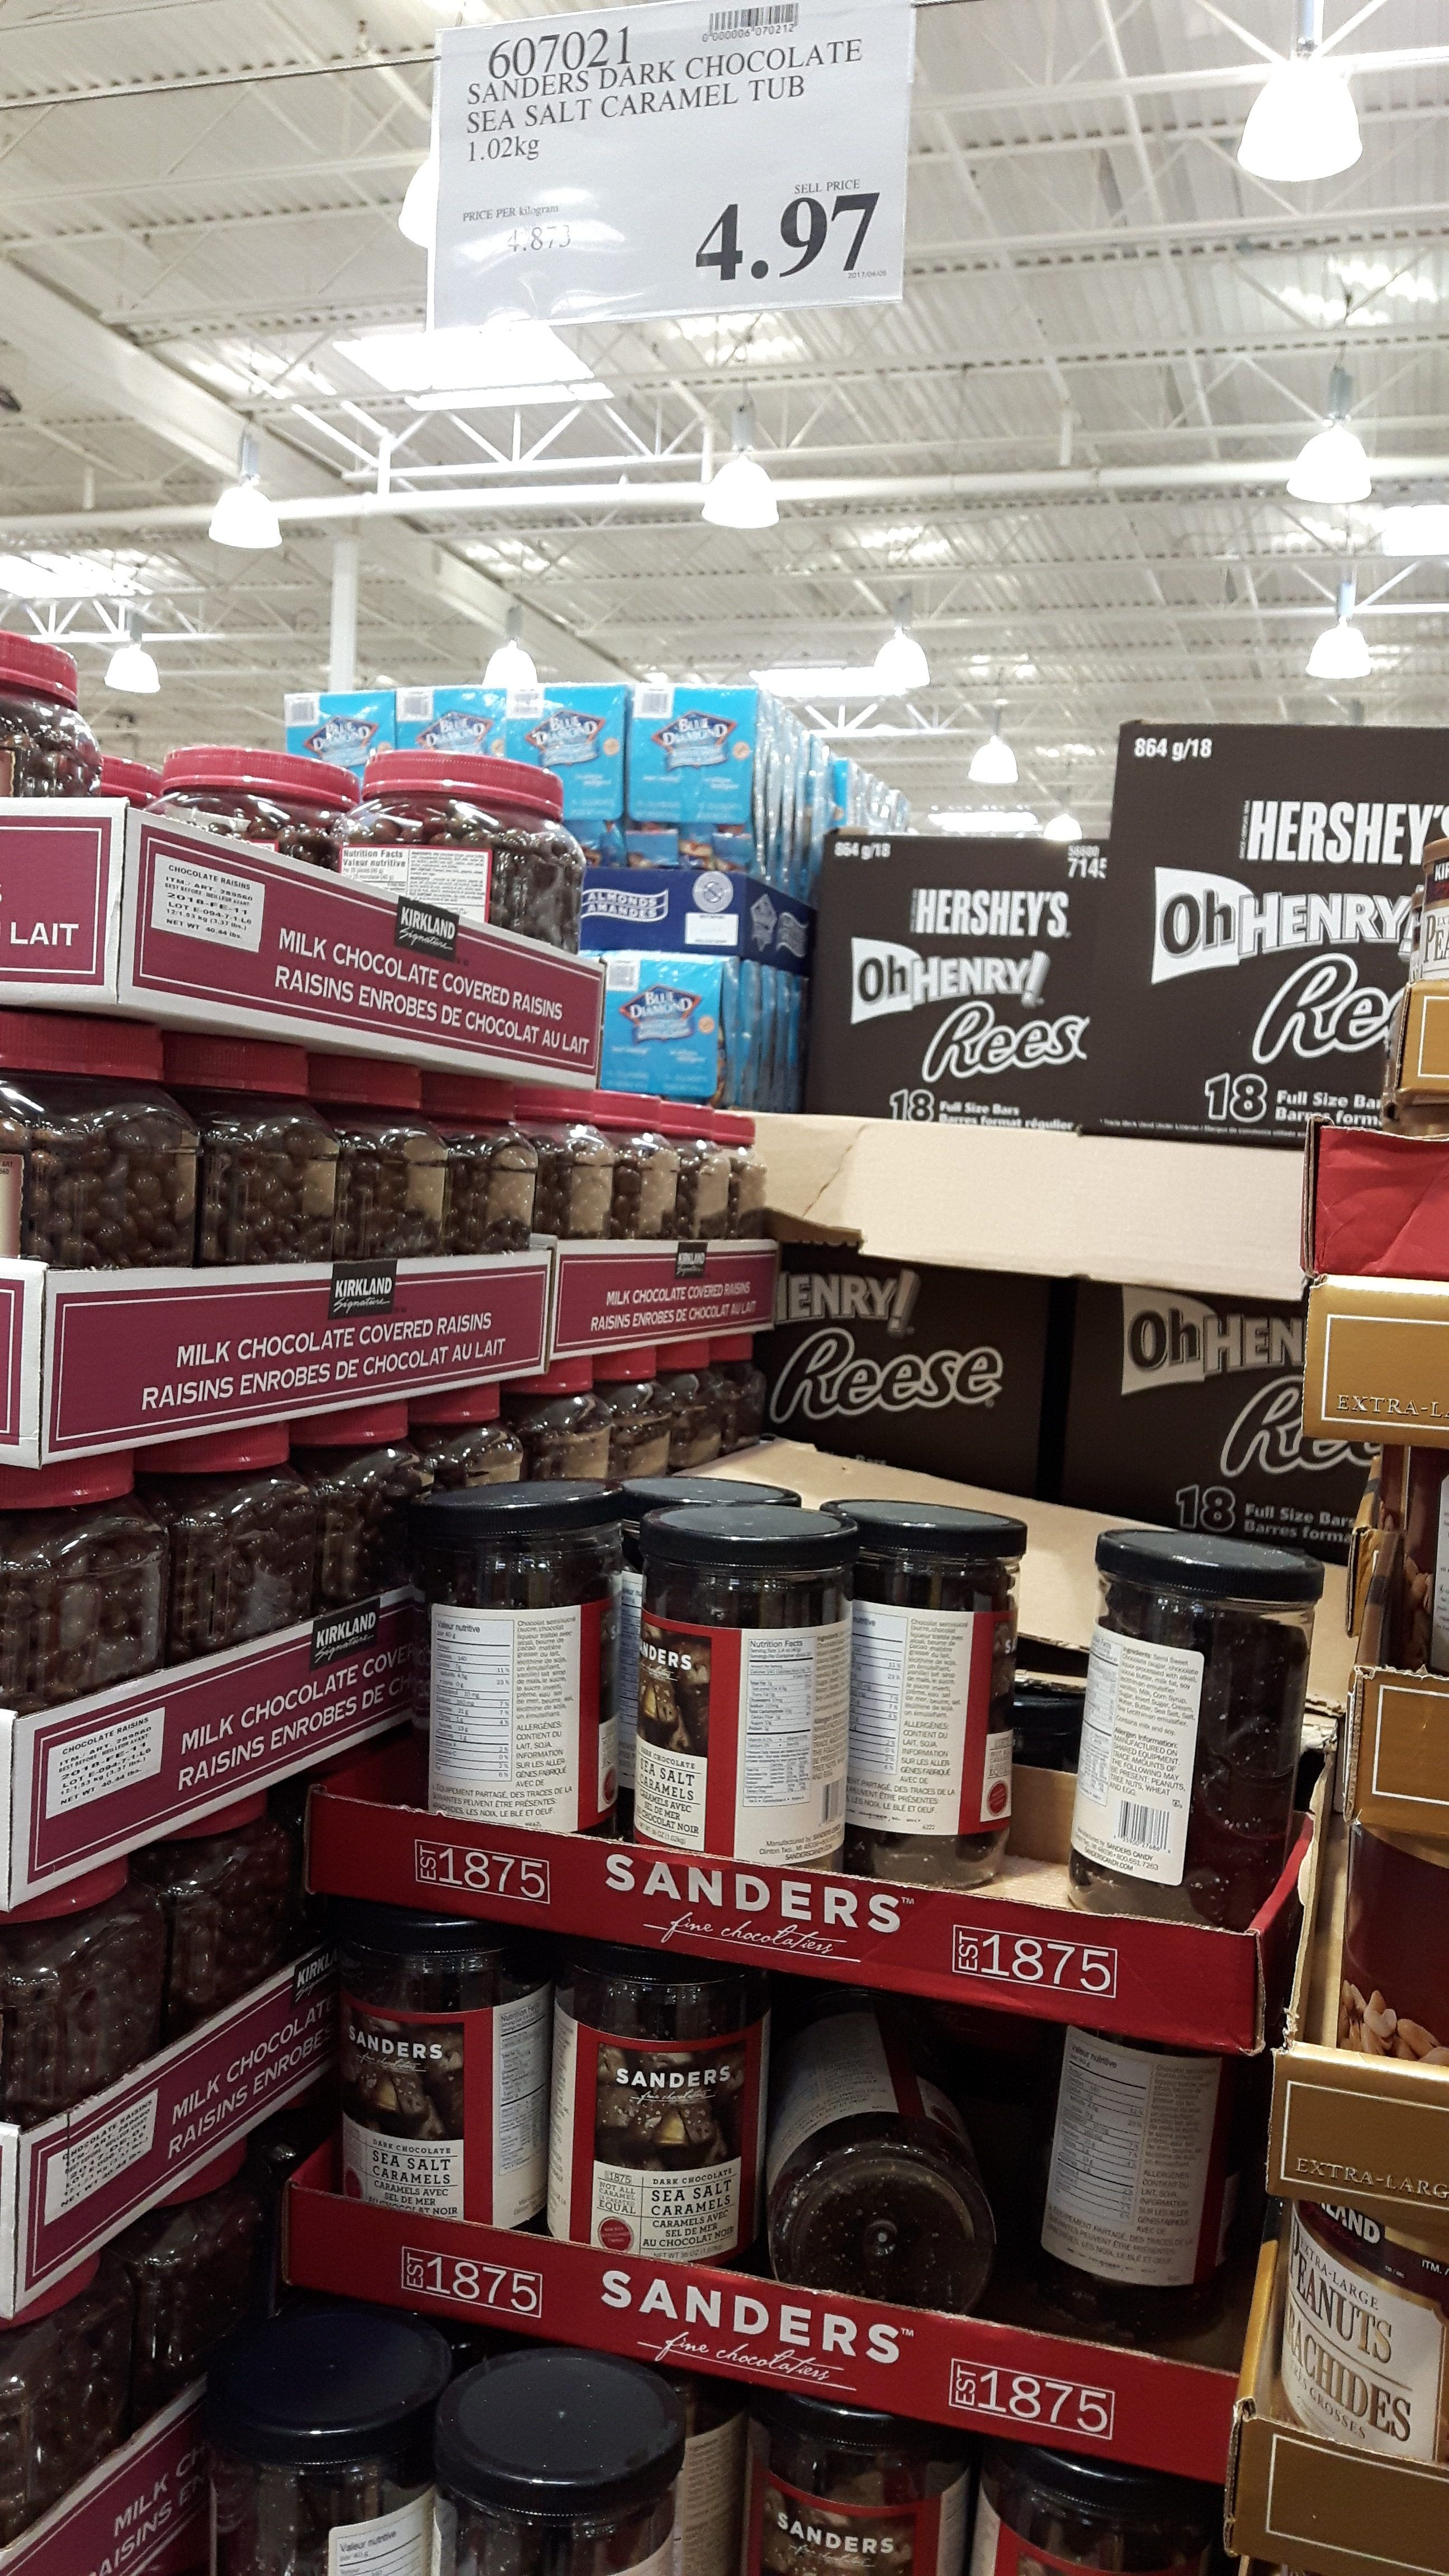 Costco Warden]Sanders Dark Chocolate Sea Salt Caramel 1.02 kg Tub ...